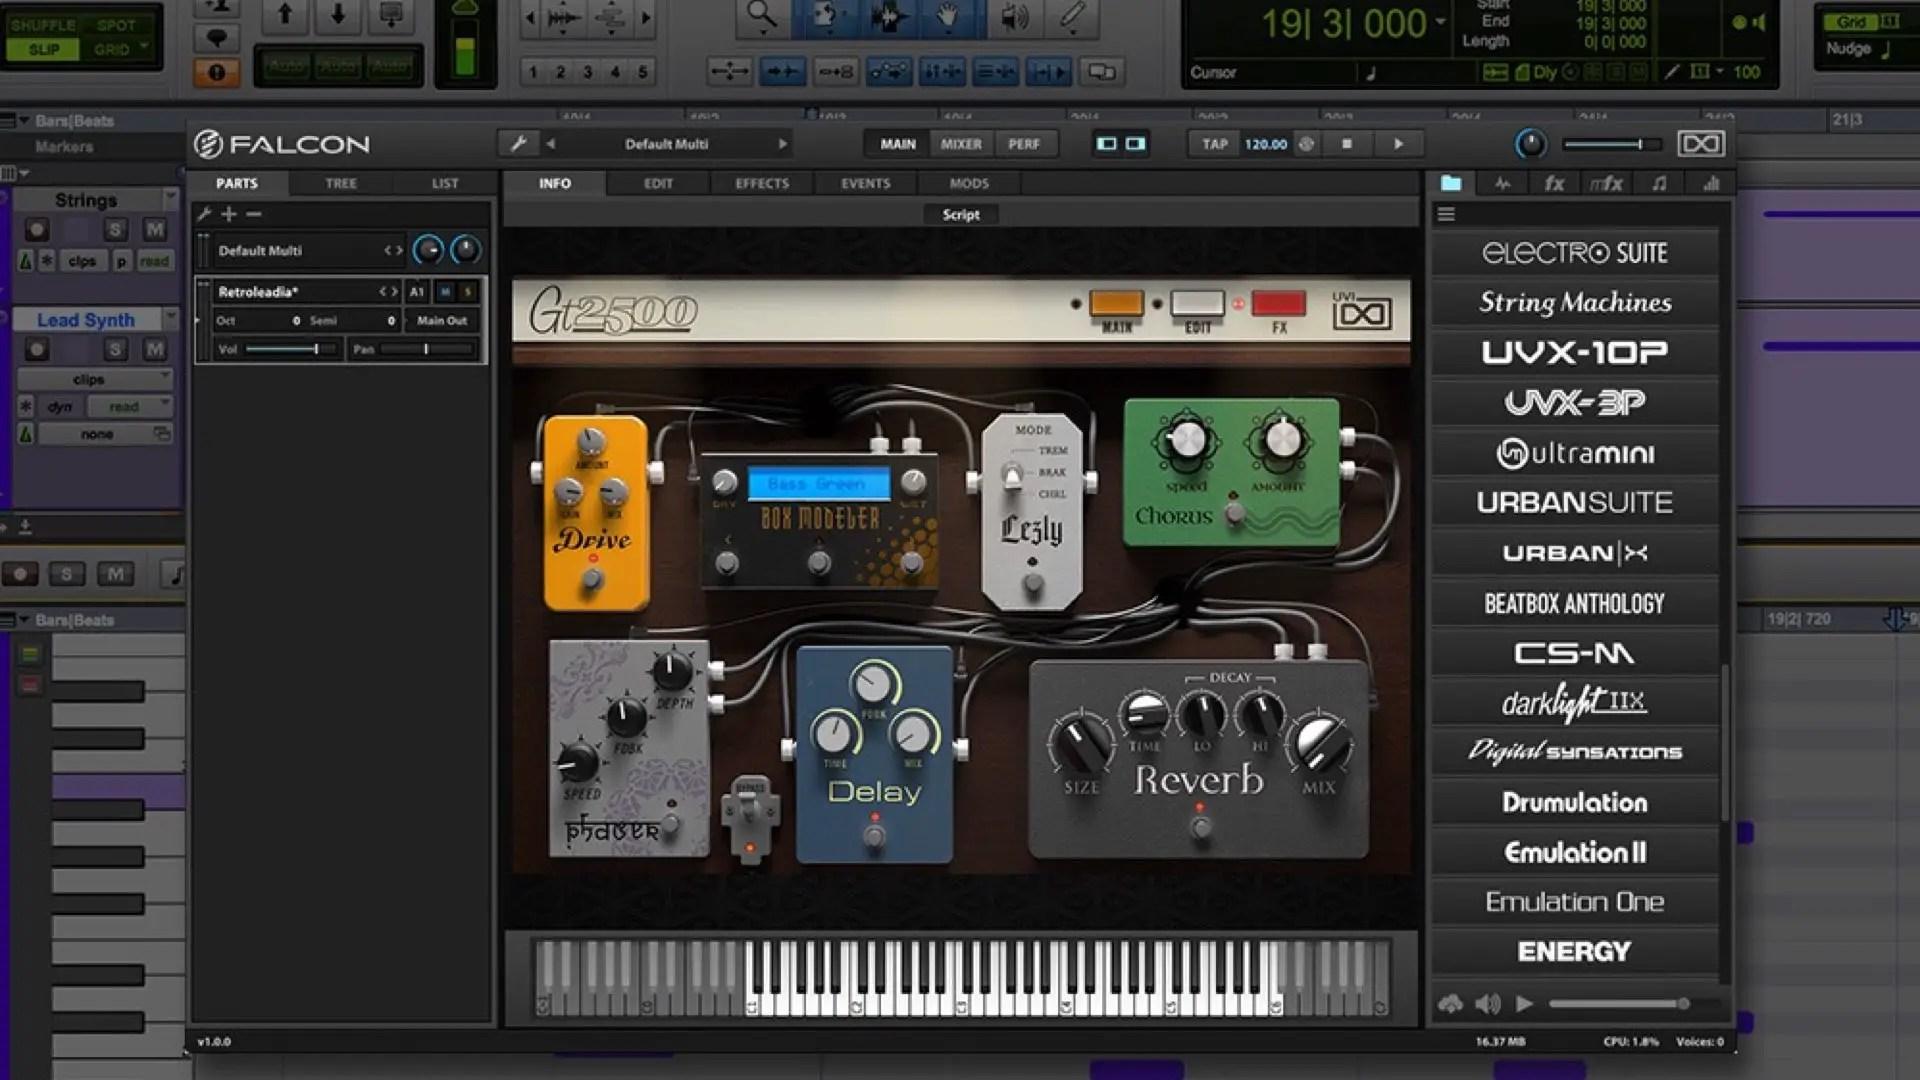 f7a3dfa5eb9 Avid Pro Tools now Includes UVI s Hybrid Virtual Instrument Falcon ...